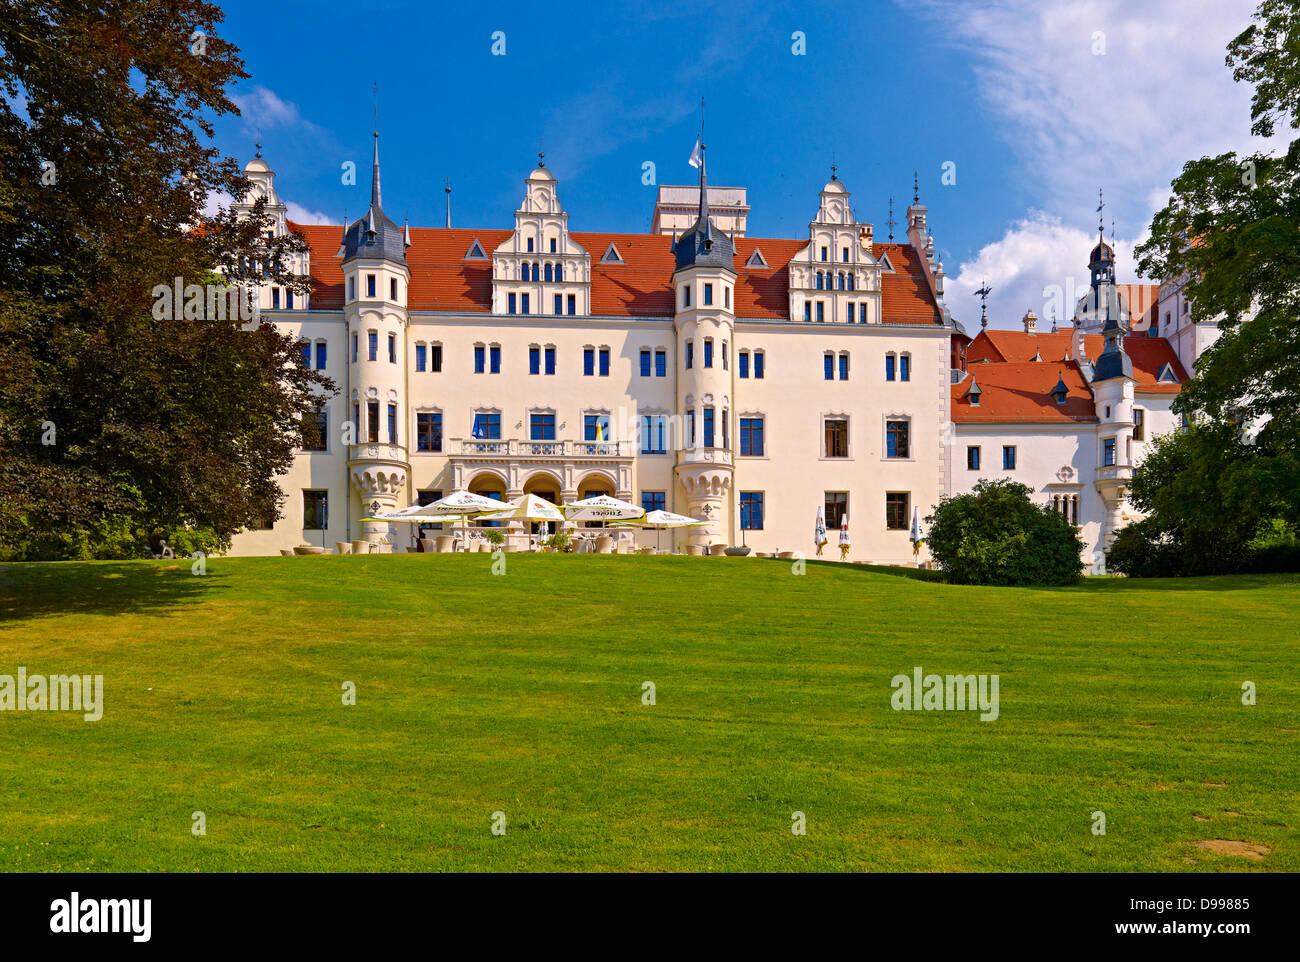 Boitzenburg Castle, Uckermark, Brandenburg, Germany - Stock Image